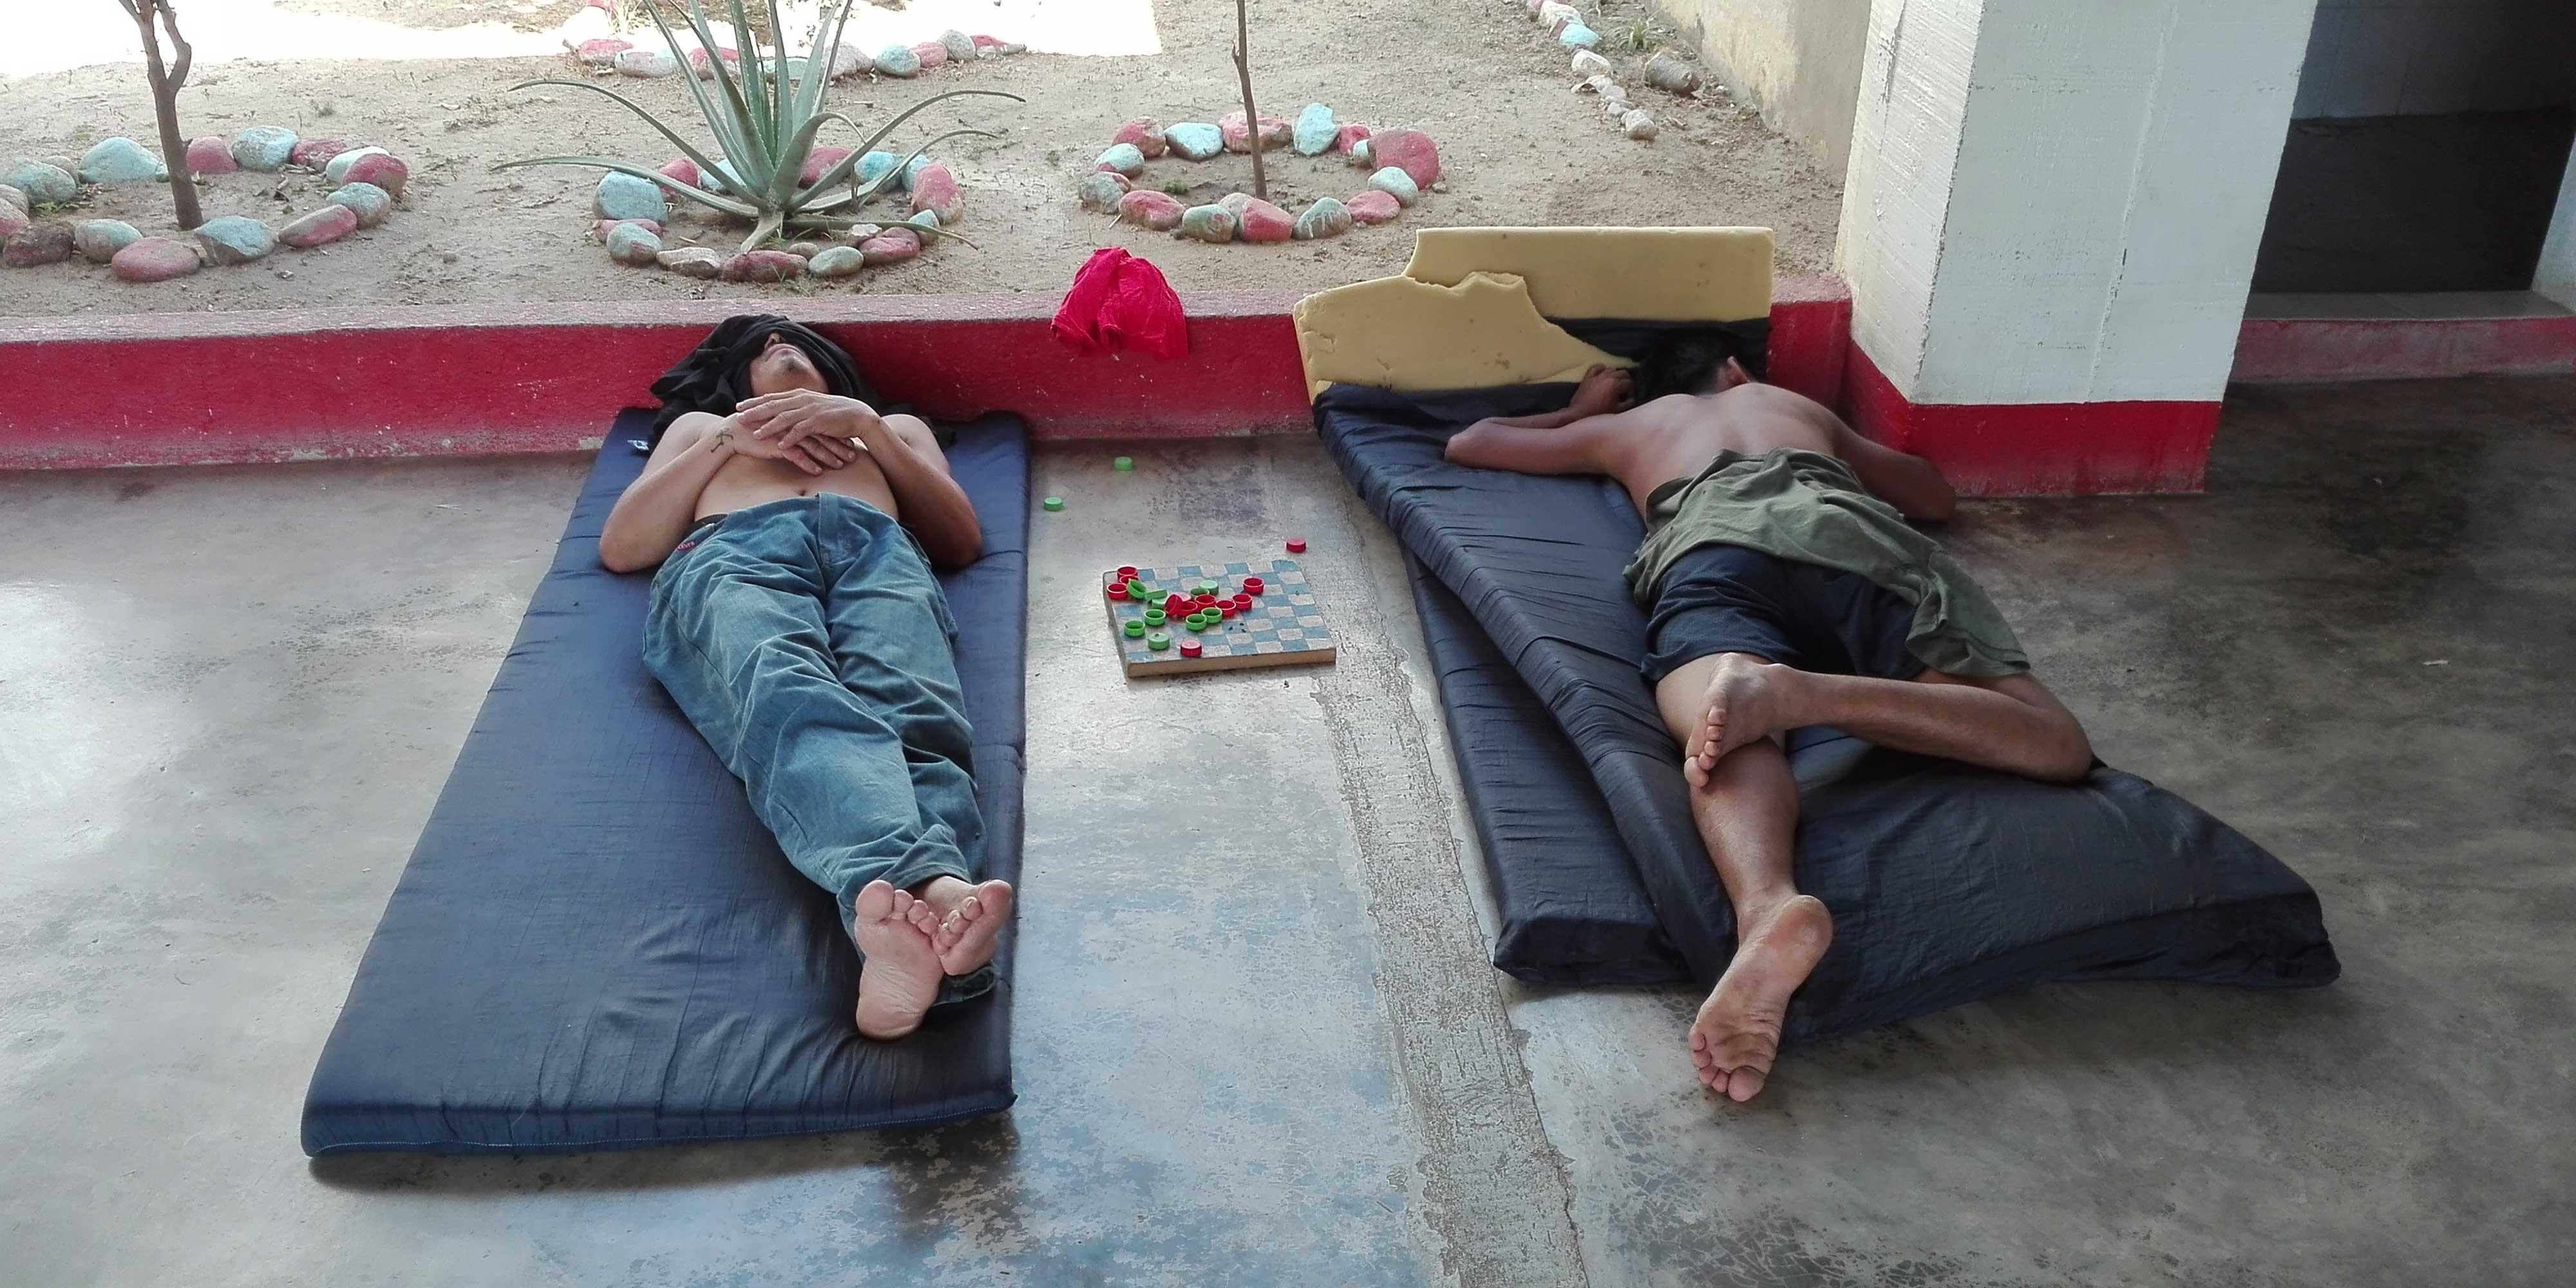 VIAGGIO DEI DESPERADOS albergo migranti riposo